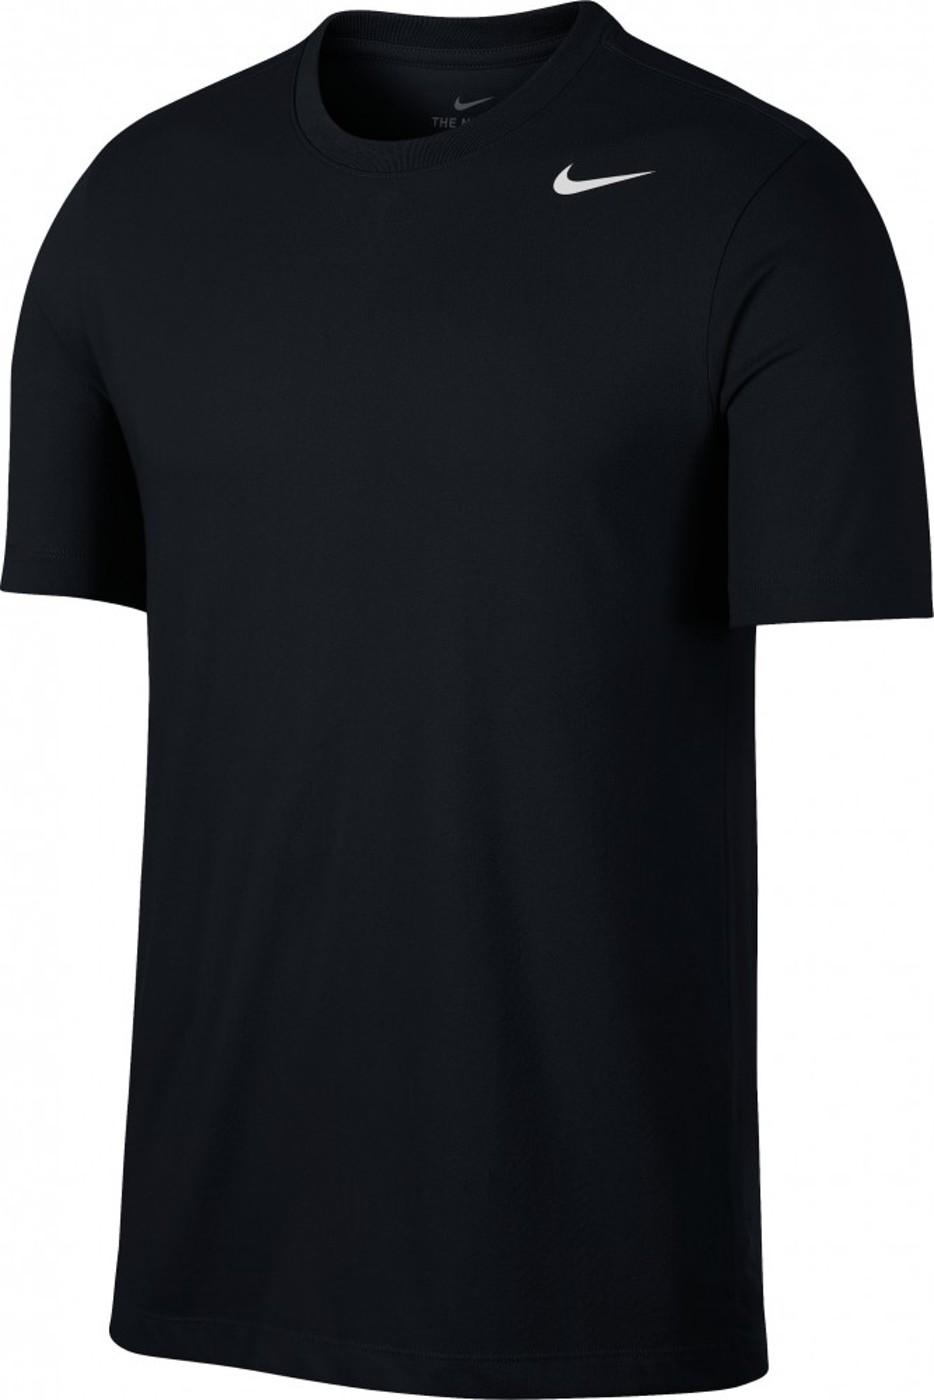 Nike Dri-FIT Training T- - Herren